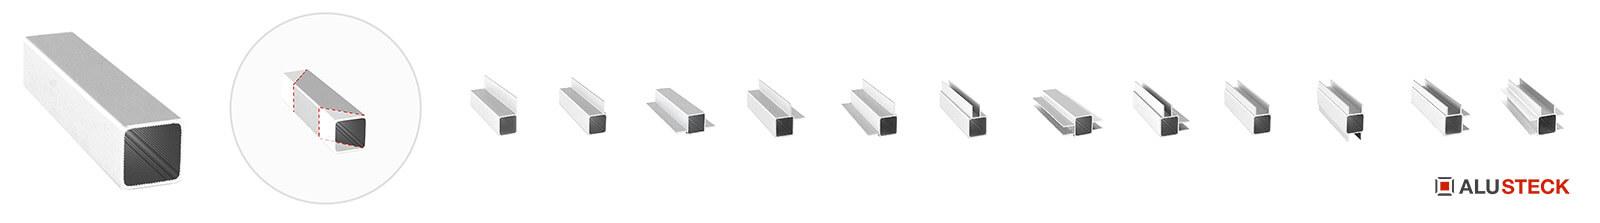 Ladenbausysteme nach Maß Ladenbau Profile Steckprofile Alu Rohre Aluminium